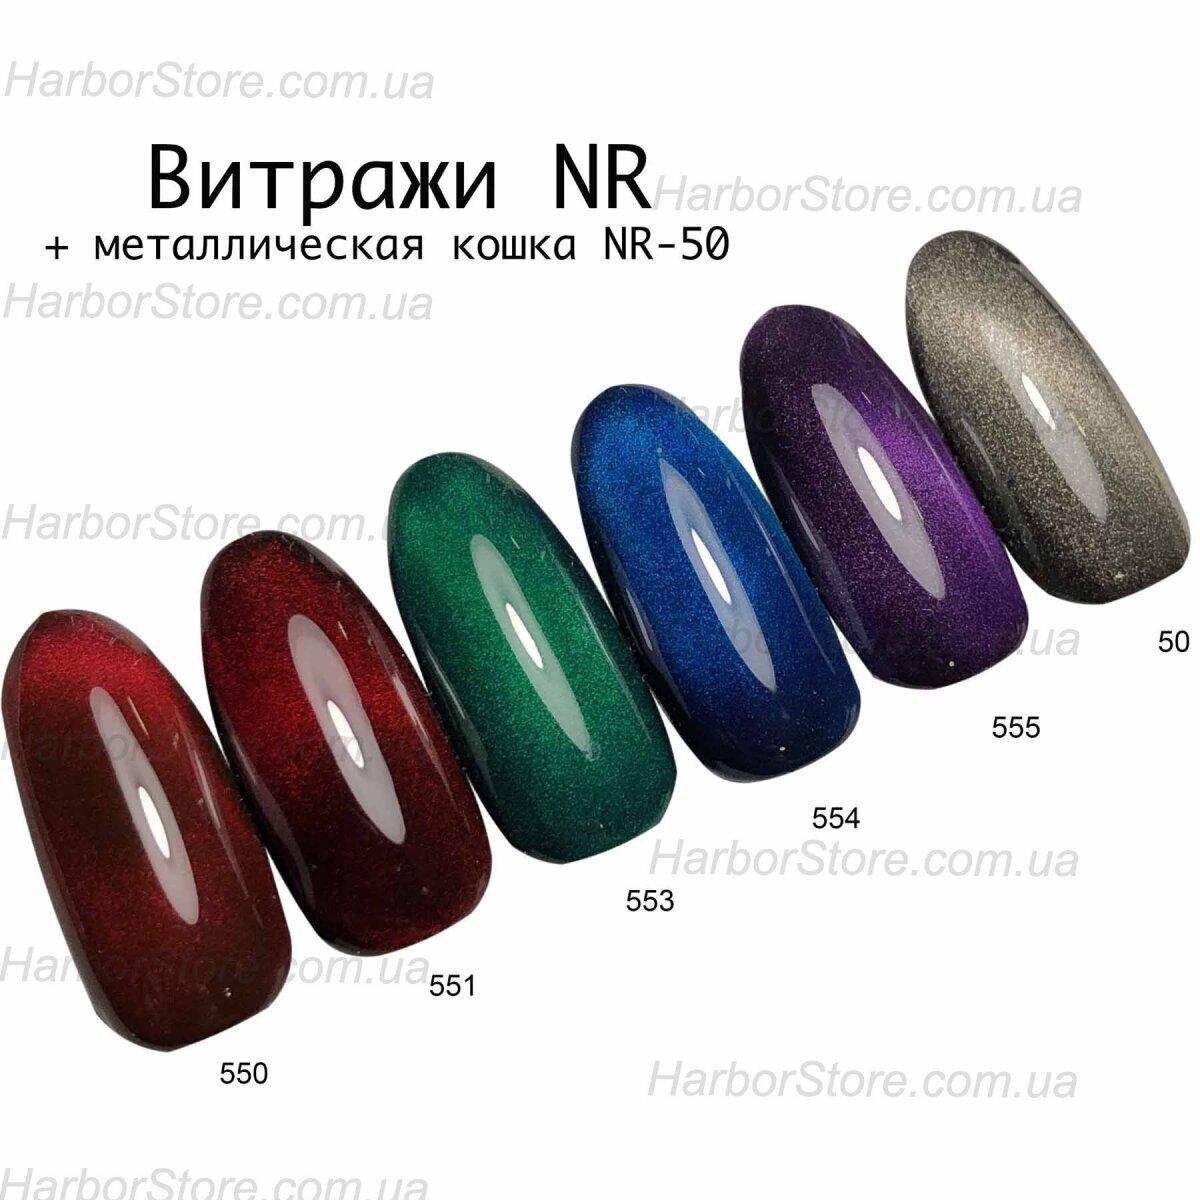 NR 555